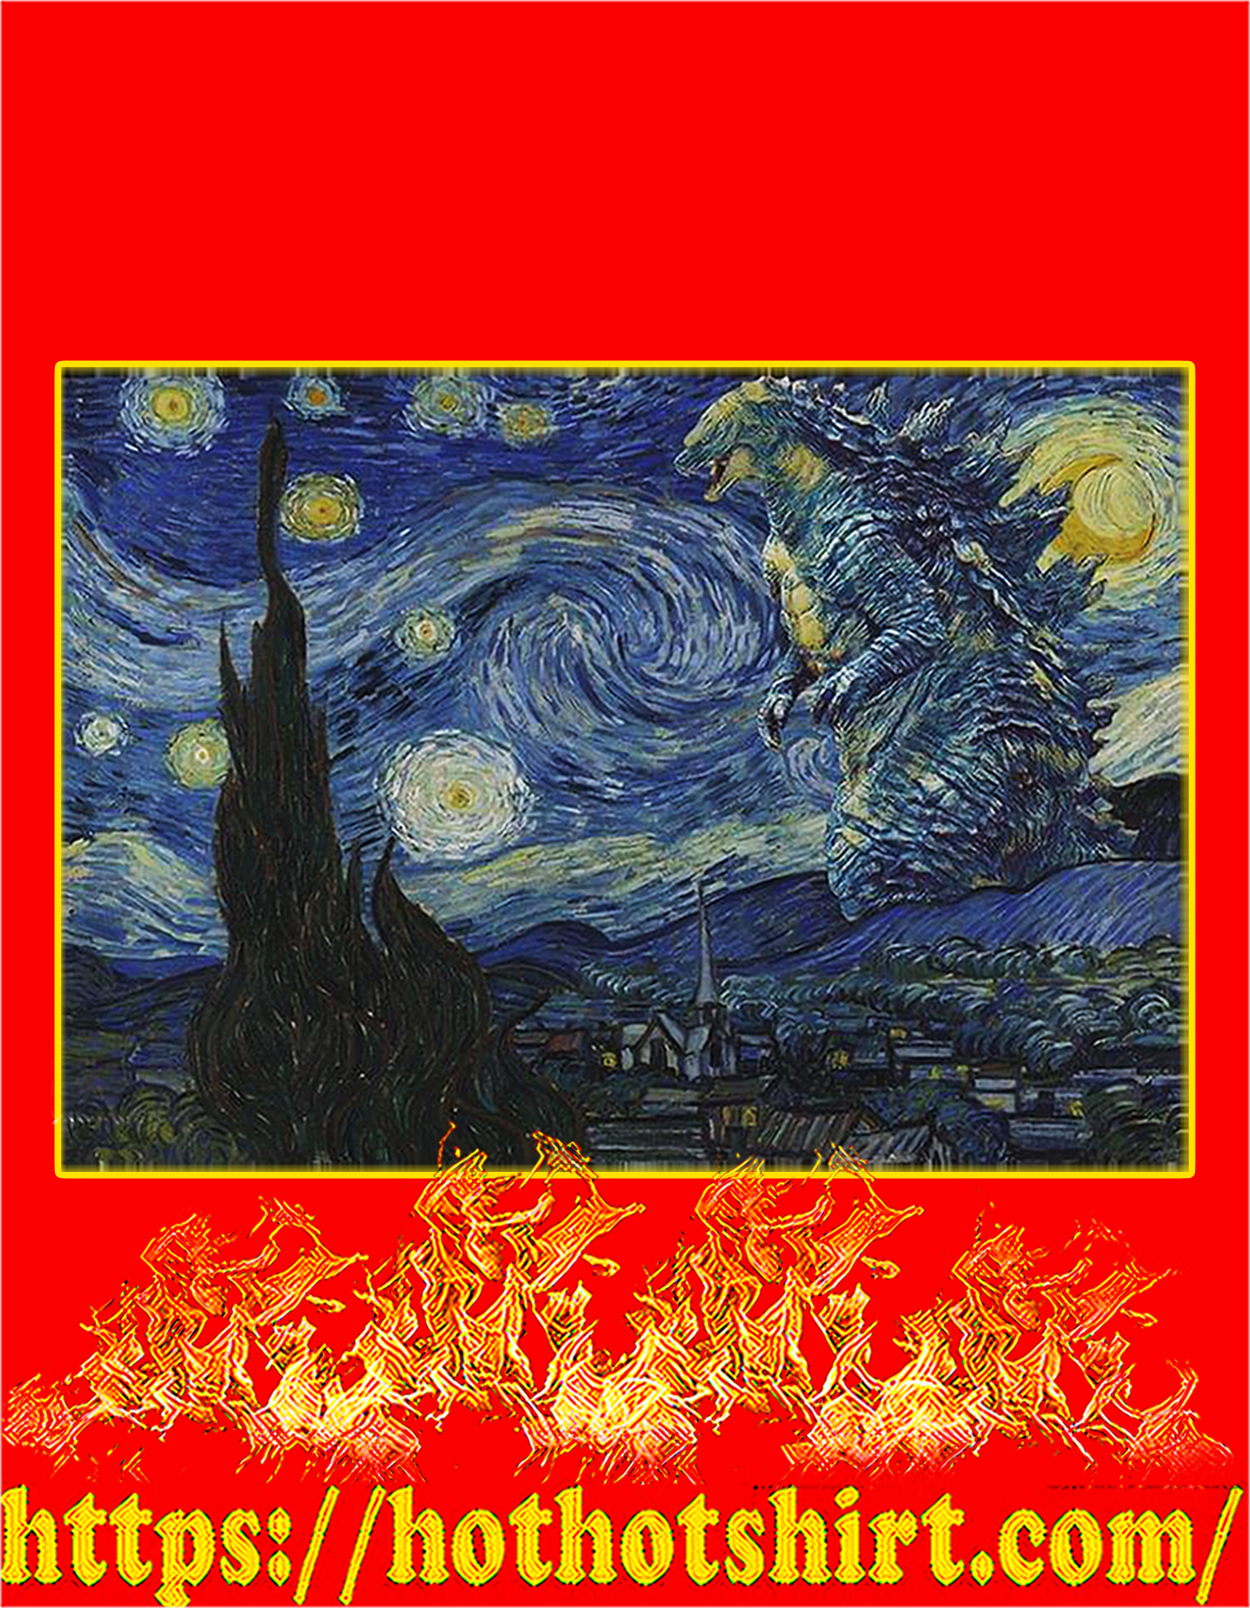 Godzzila starry night poster - A2